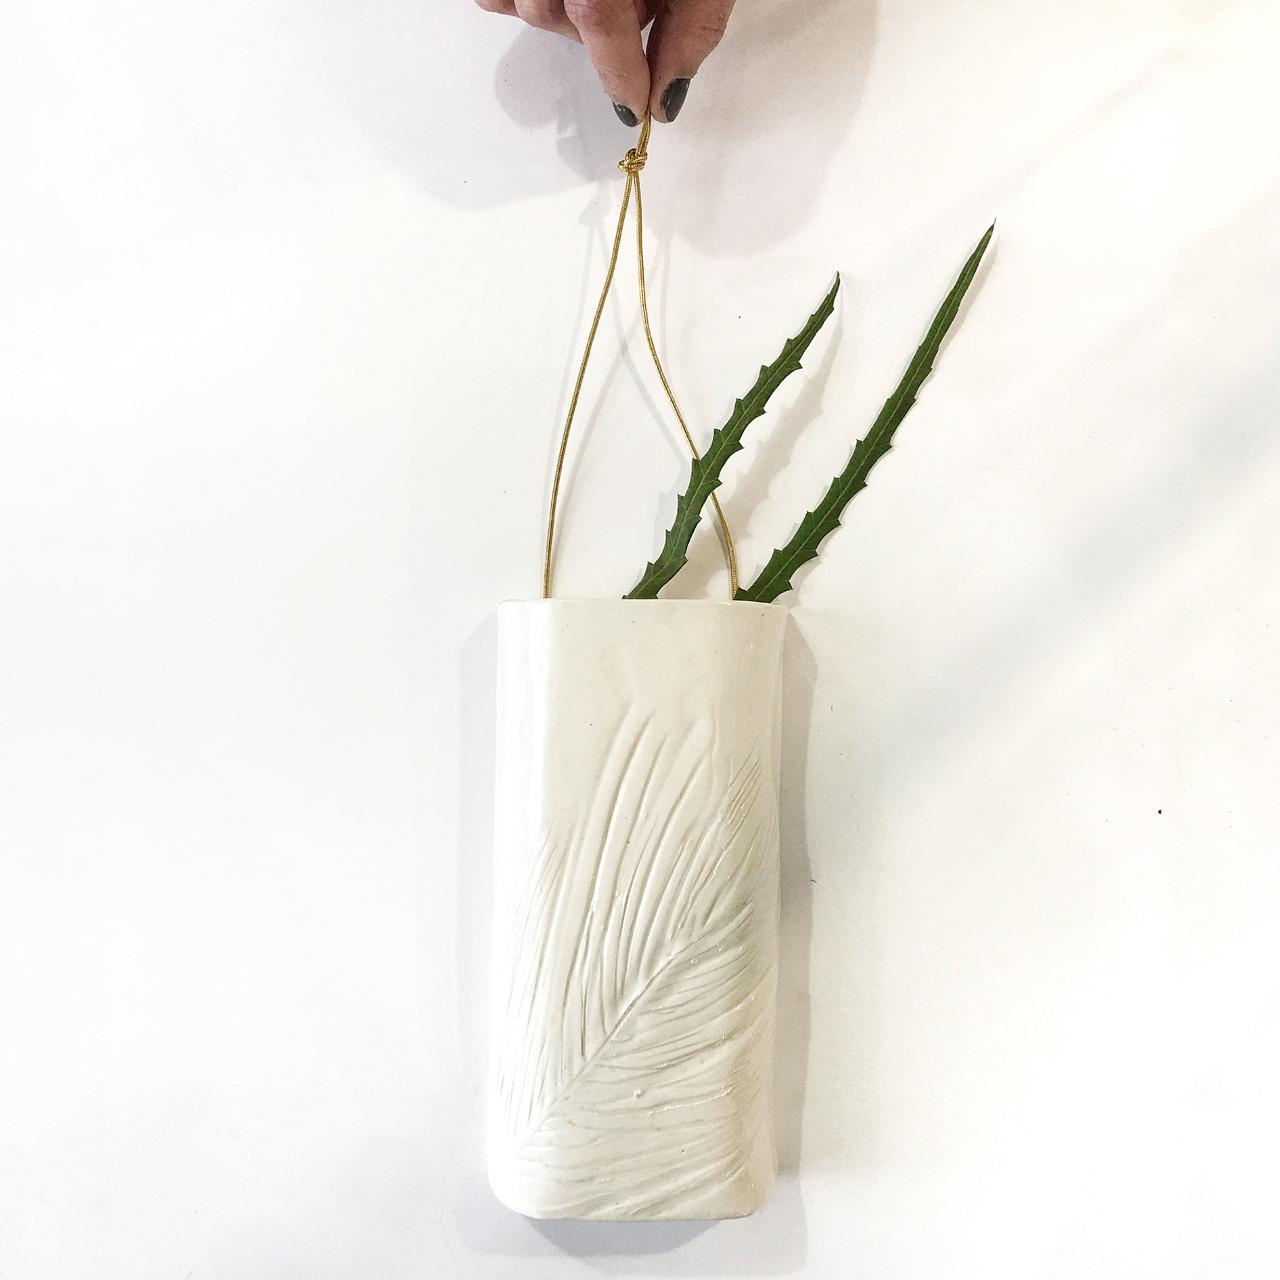 Wall Vase II - Le Voila